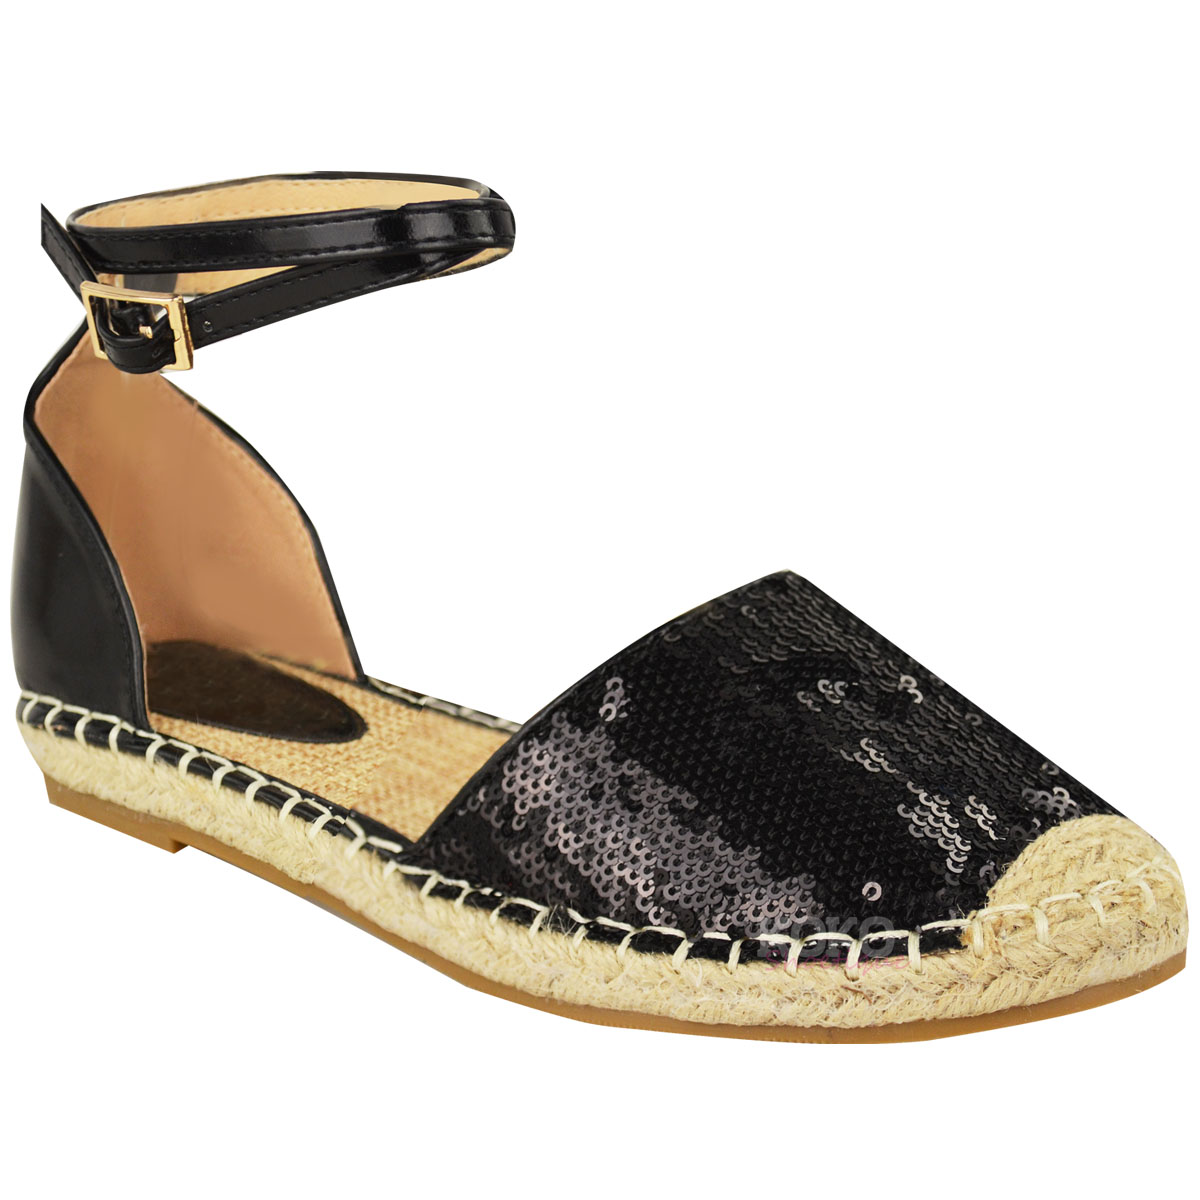 New Womens Ladies Summer Espadrilles Sandals Flat Ankle ...